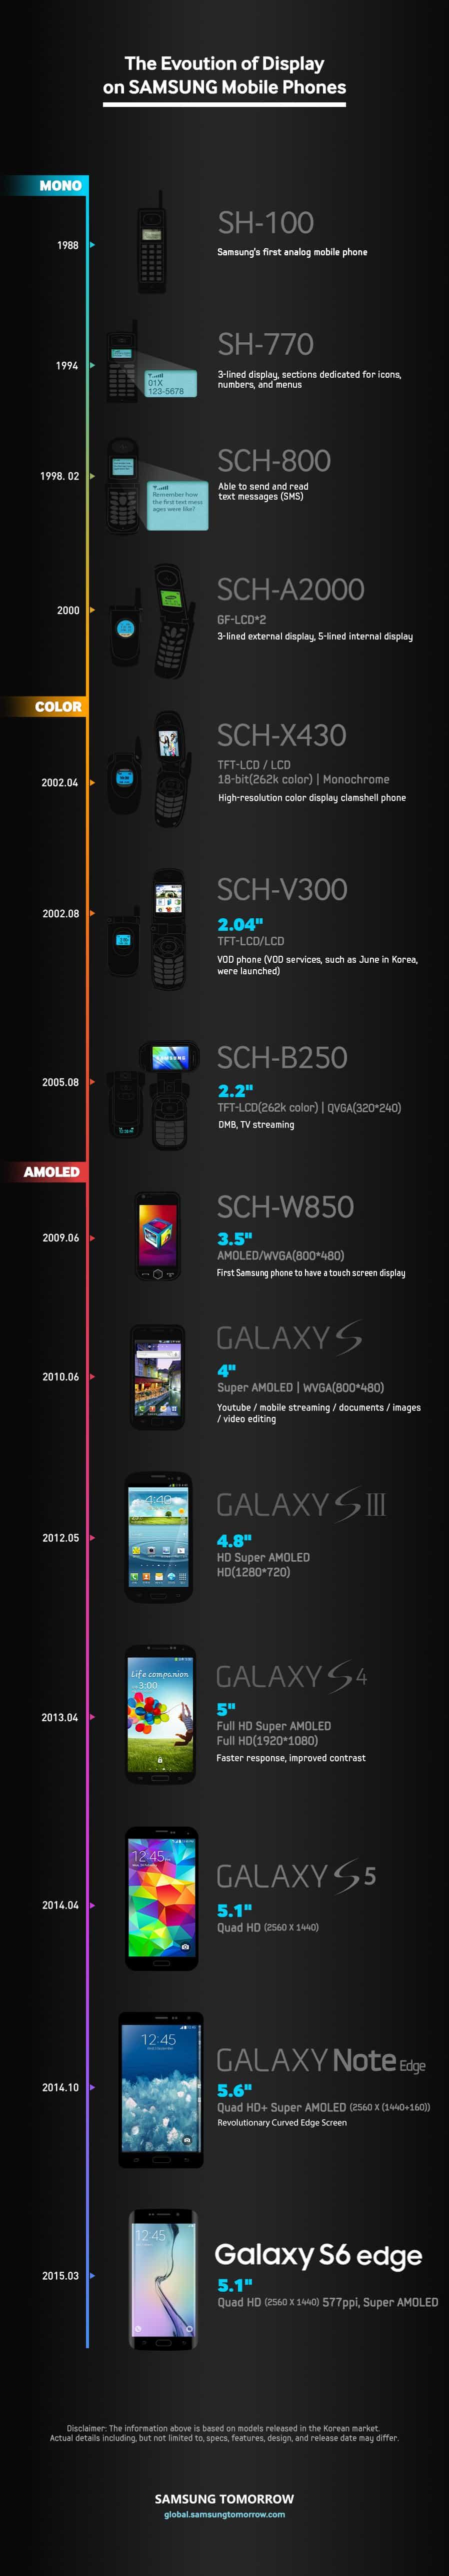 samsung-display-infographic